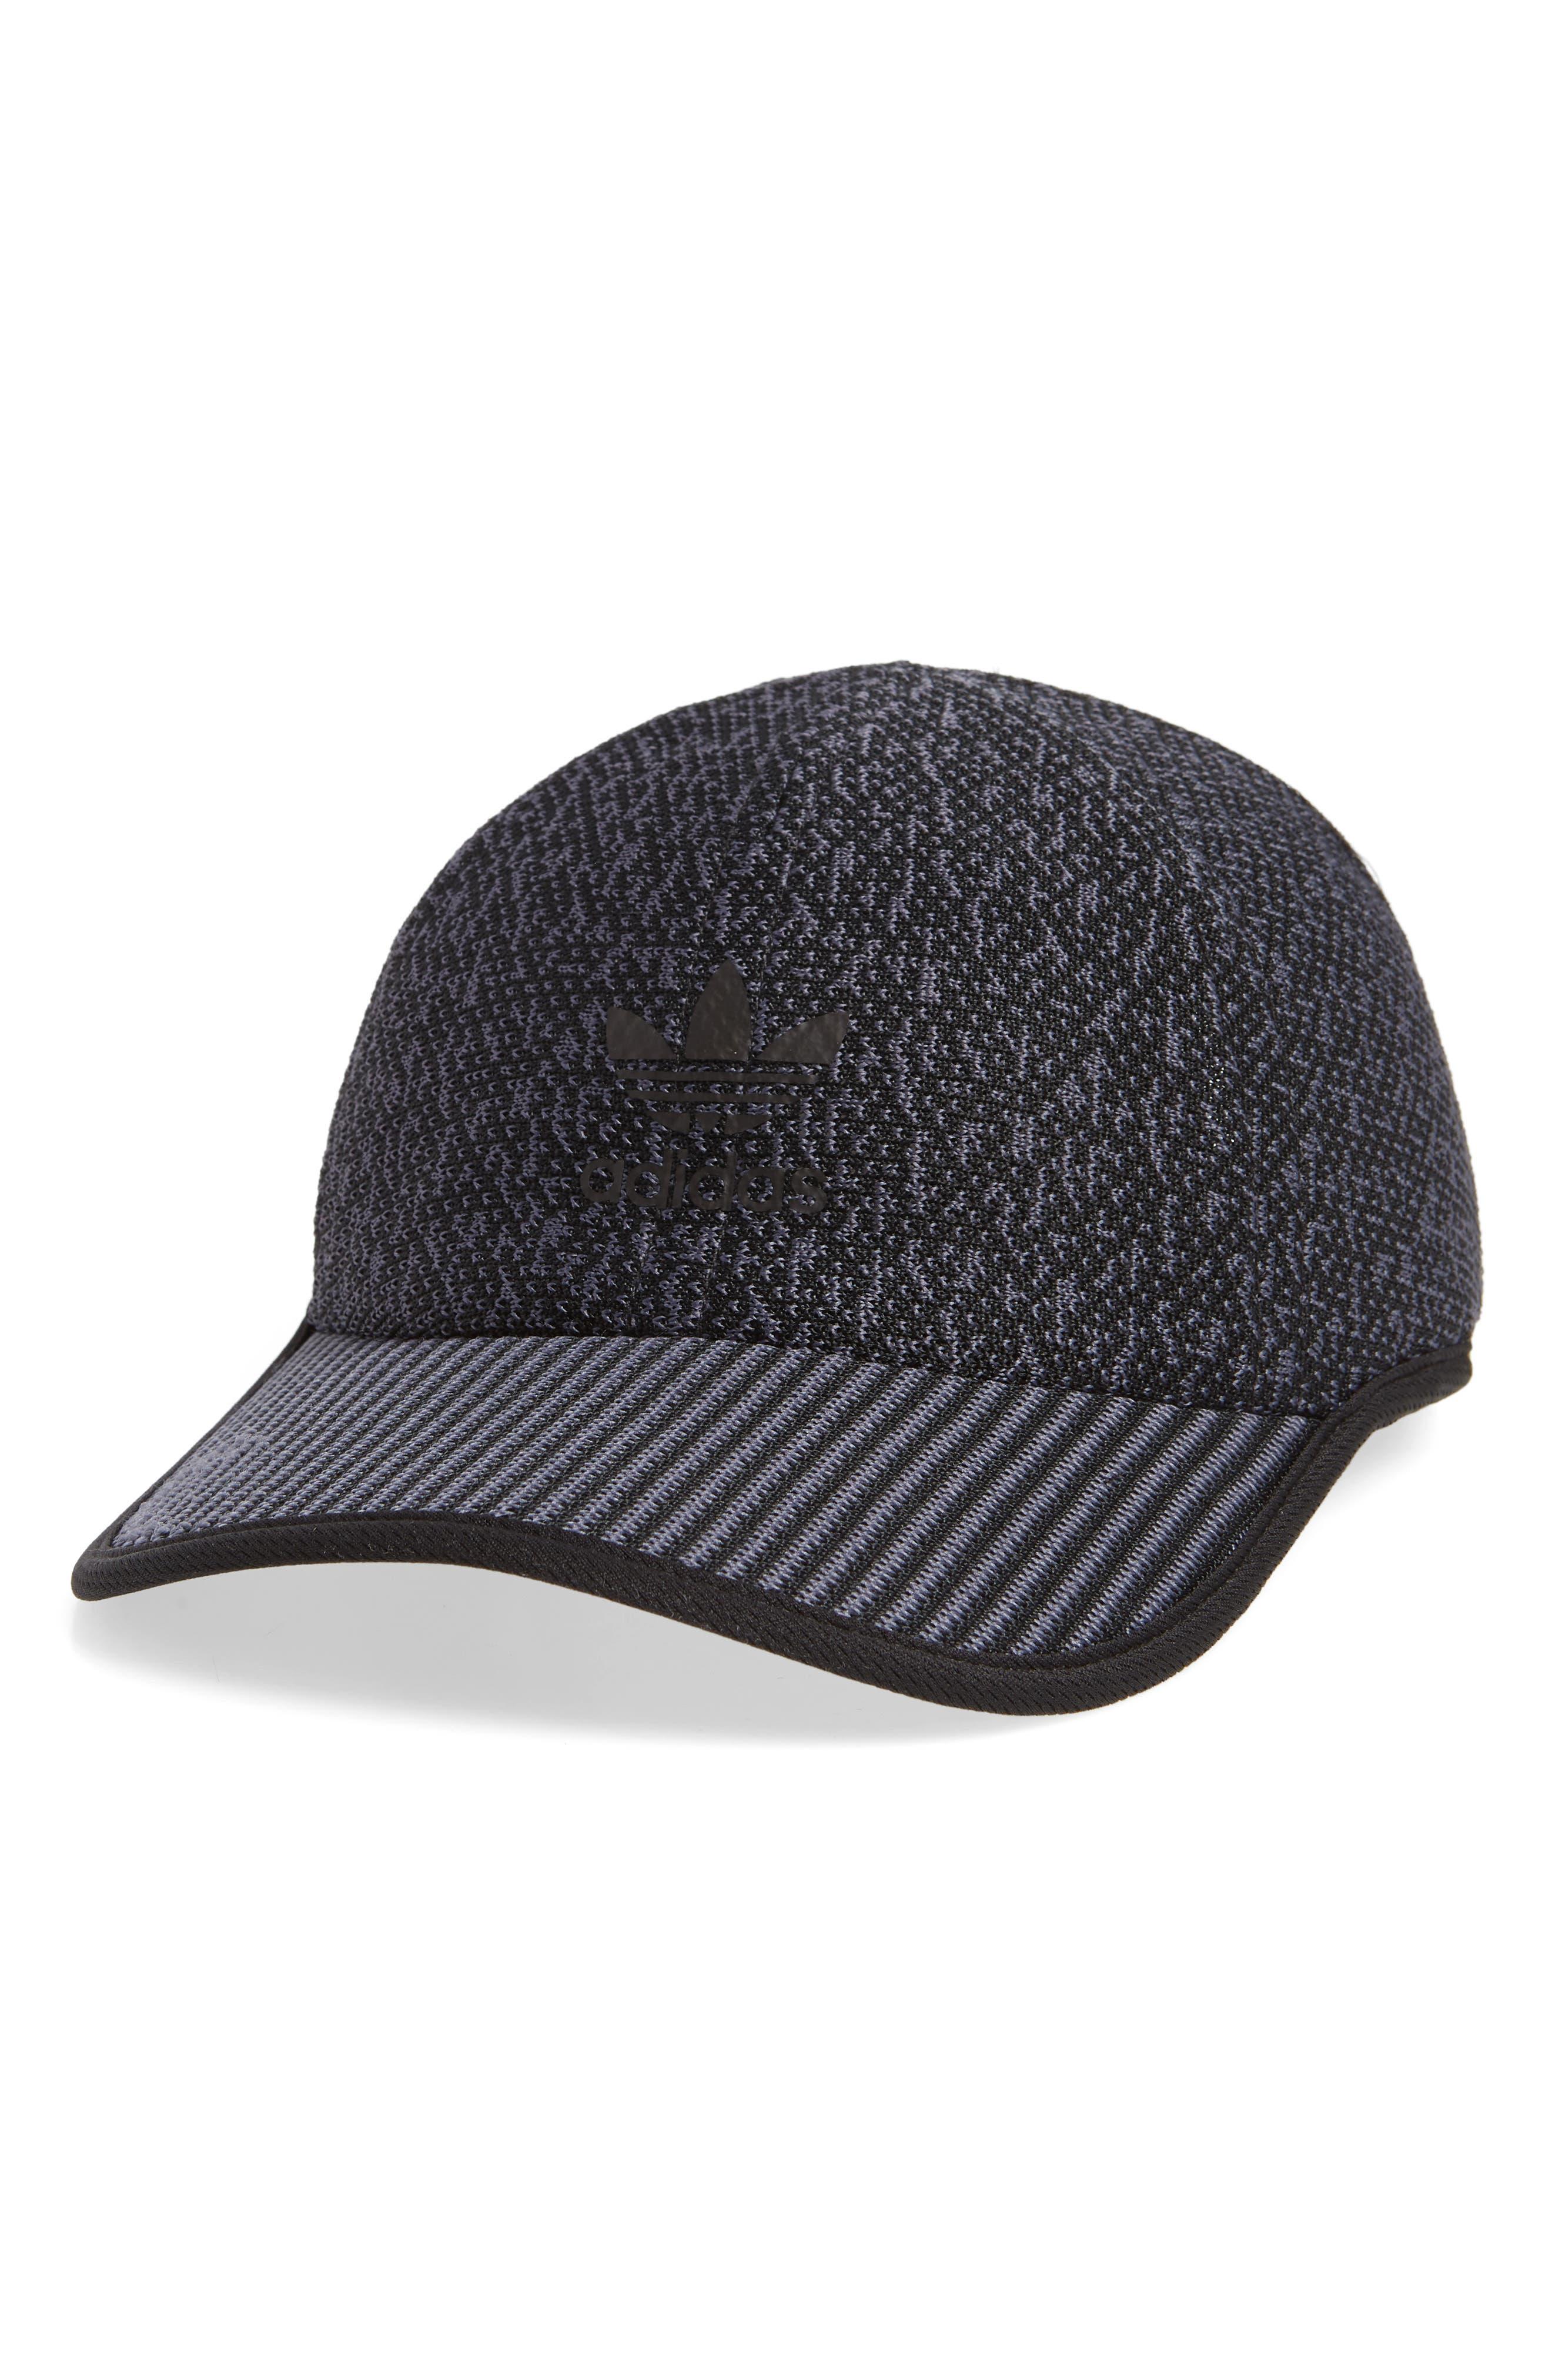 Primeknit II Baseball Cap,                         Main,                         color, BLACK/ ONIX